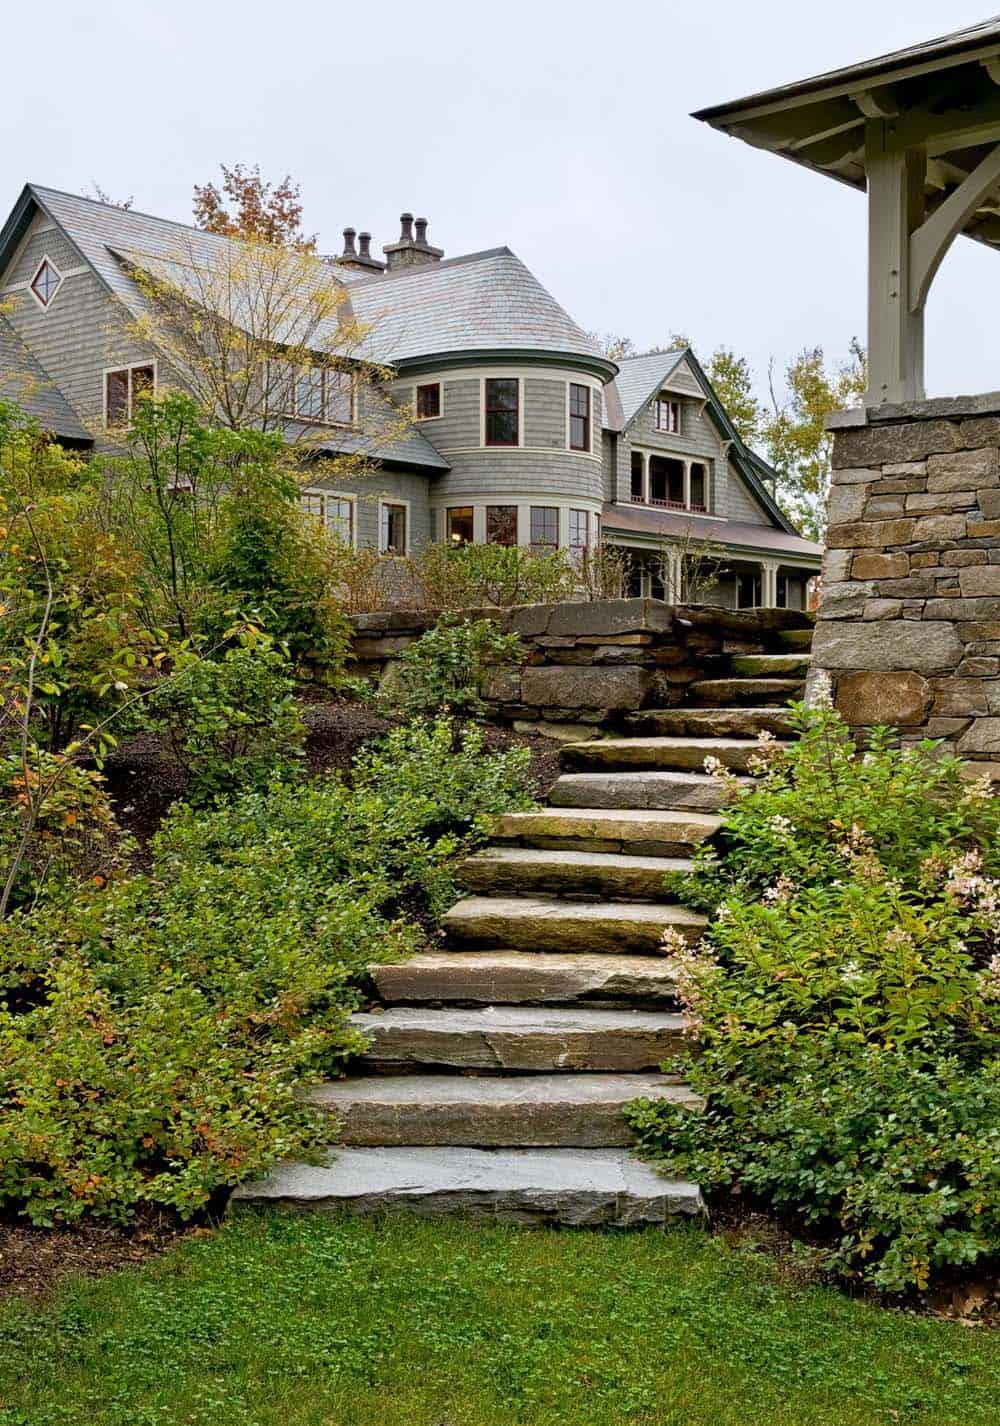 shingle-style-home-landscape-staircase-gazebo